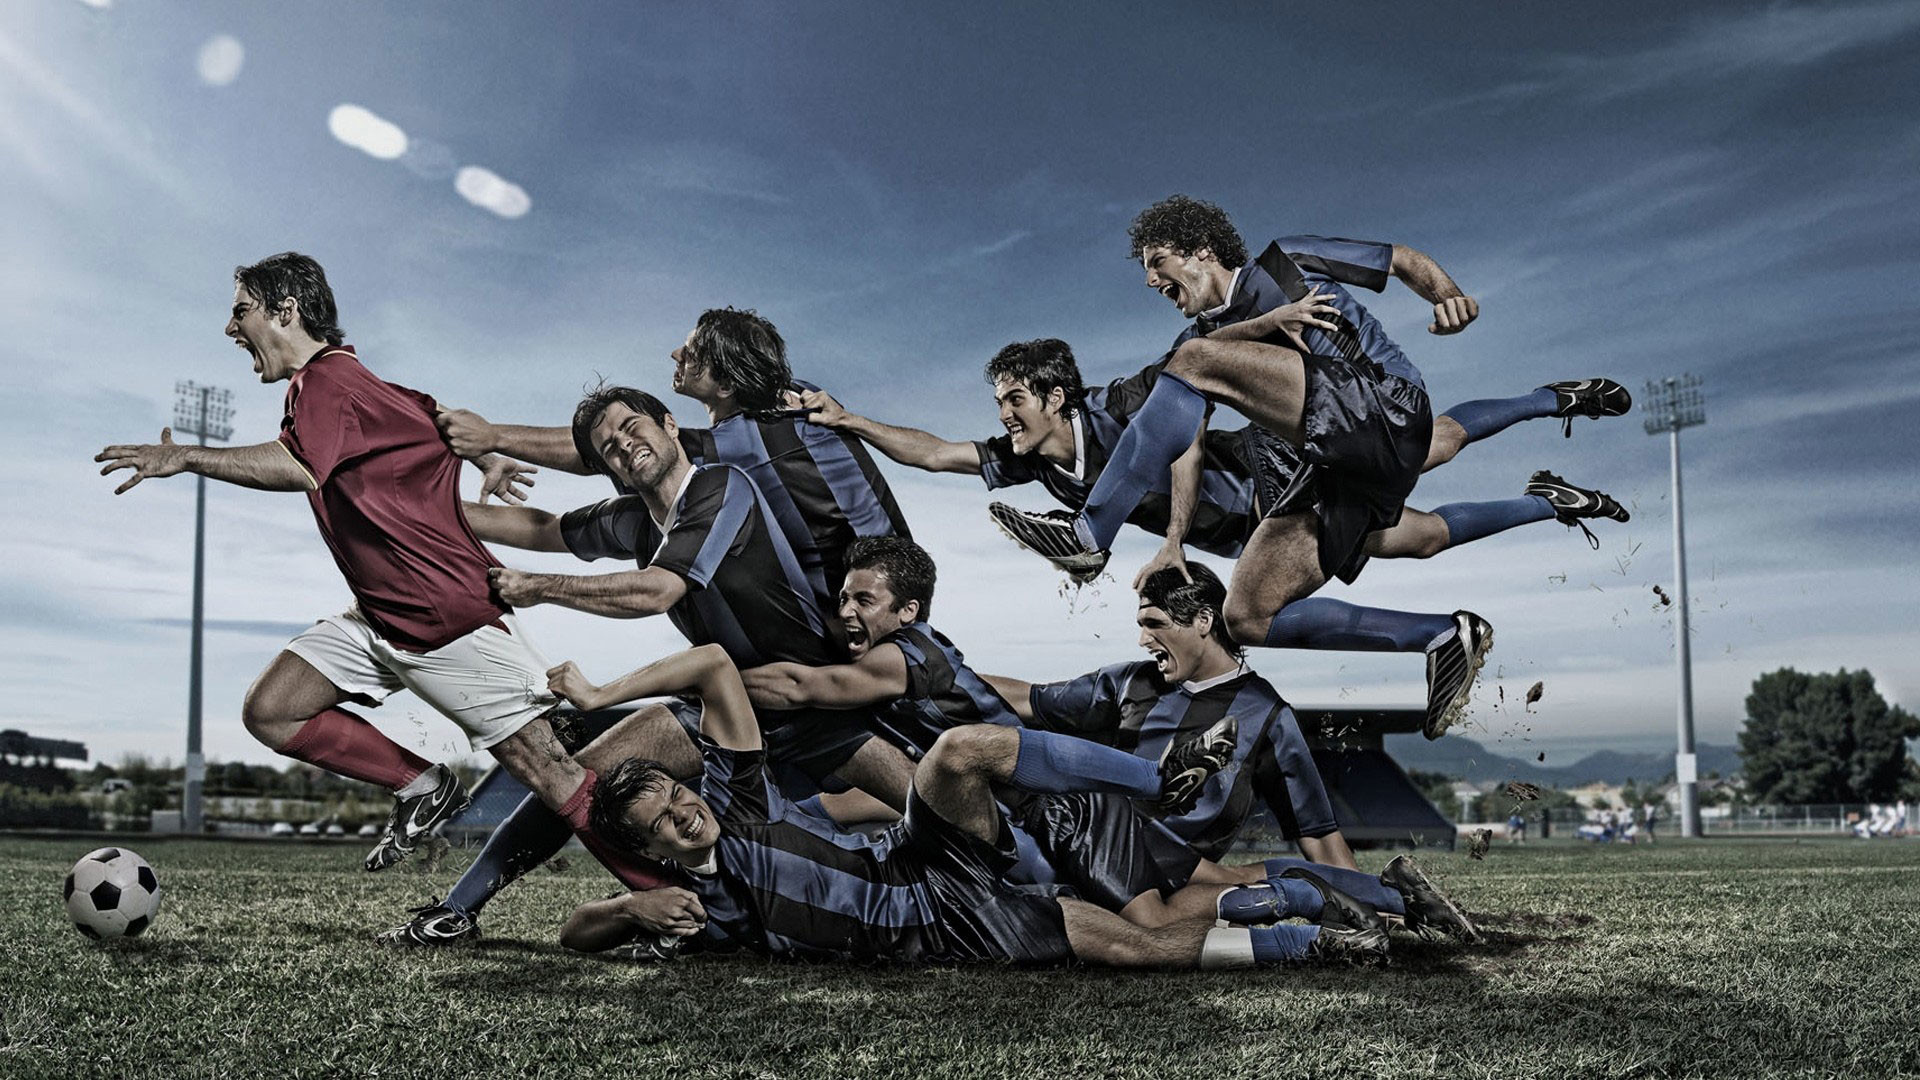 hd pics photos sports football mania hd desktop background wallpaper